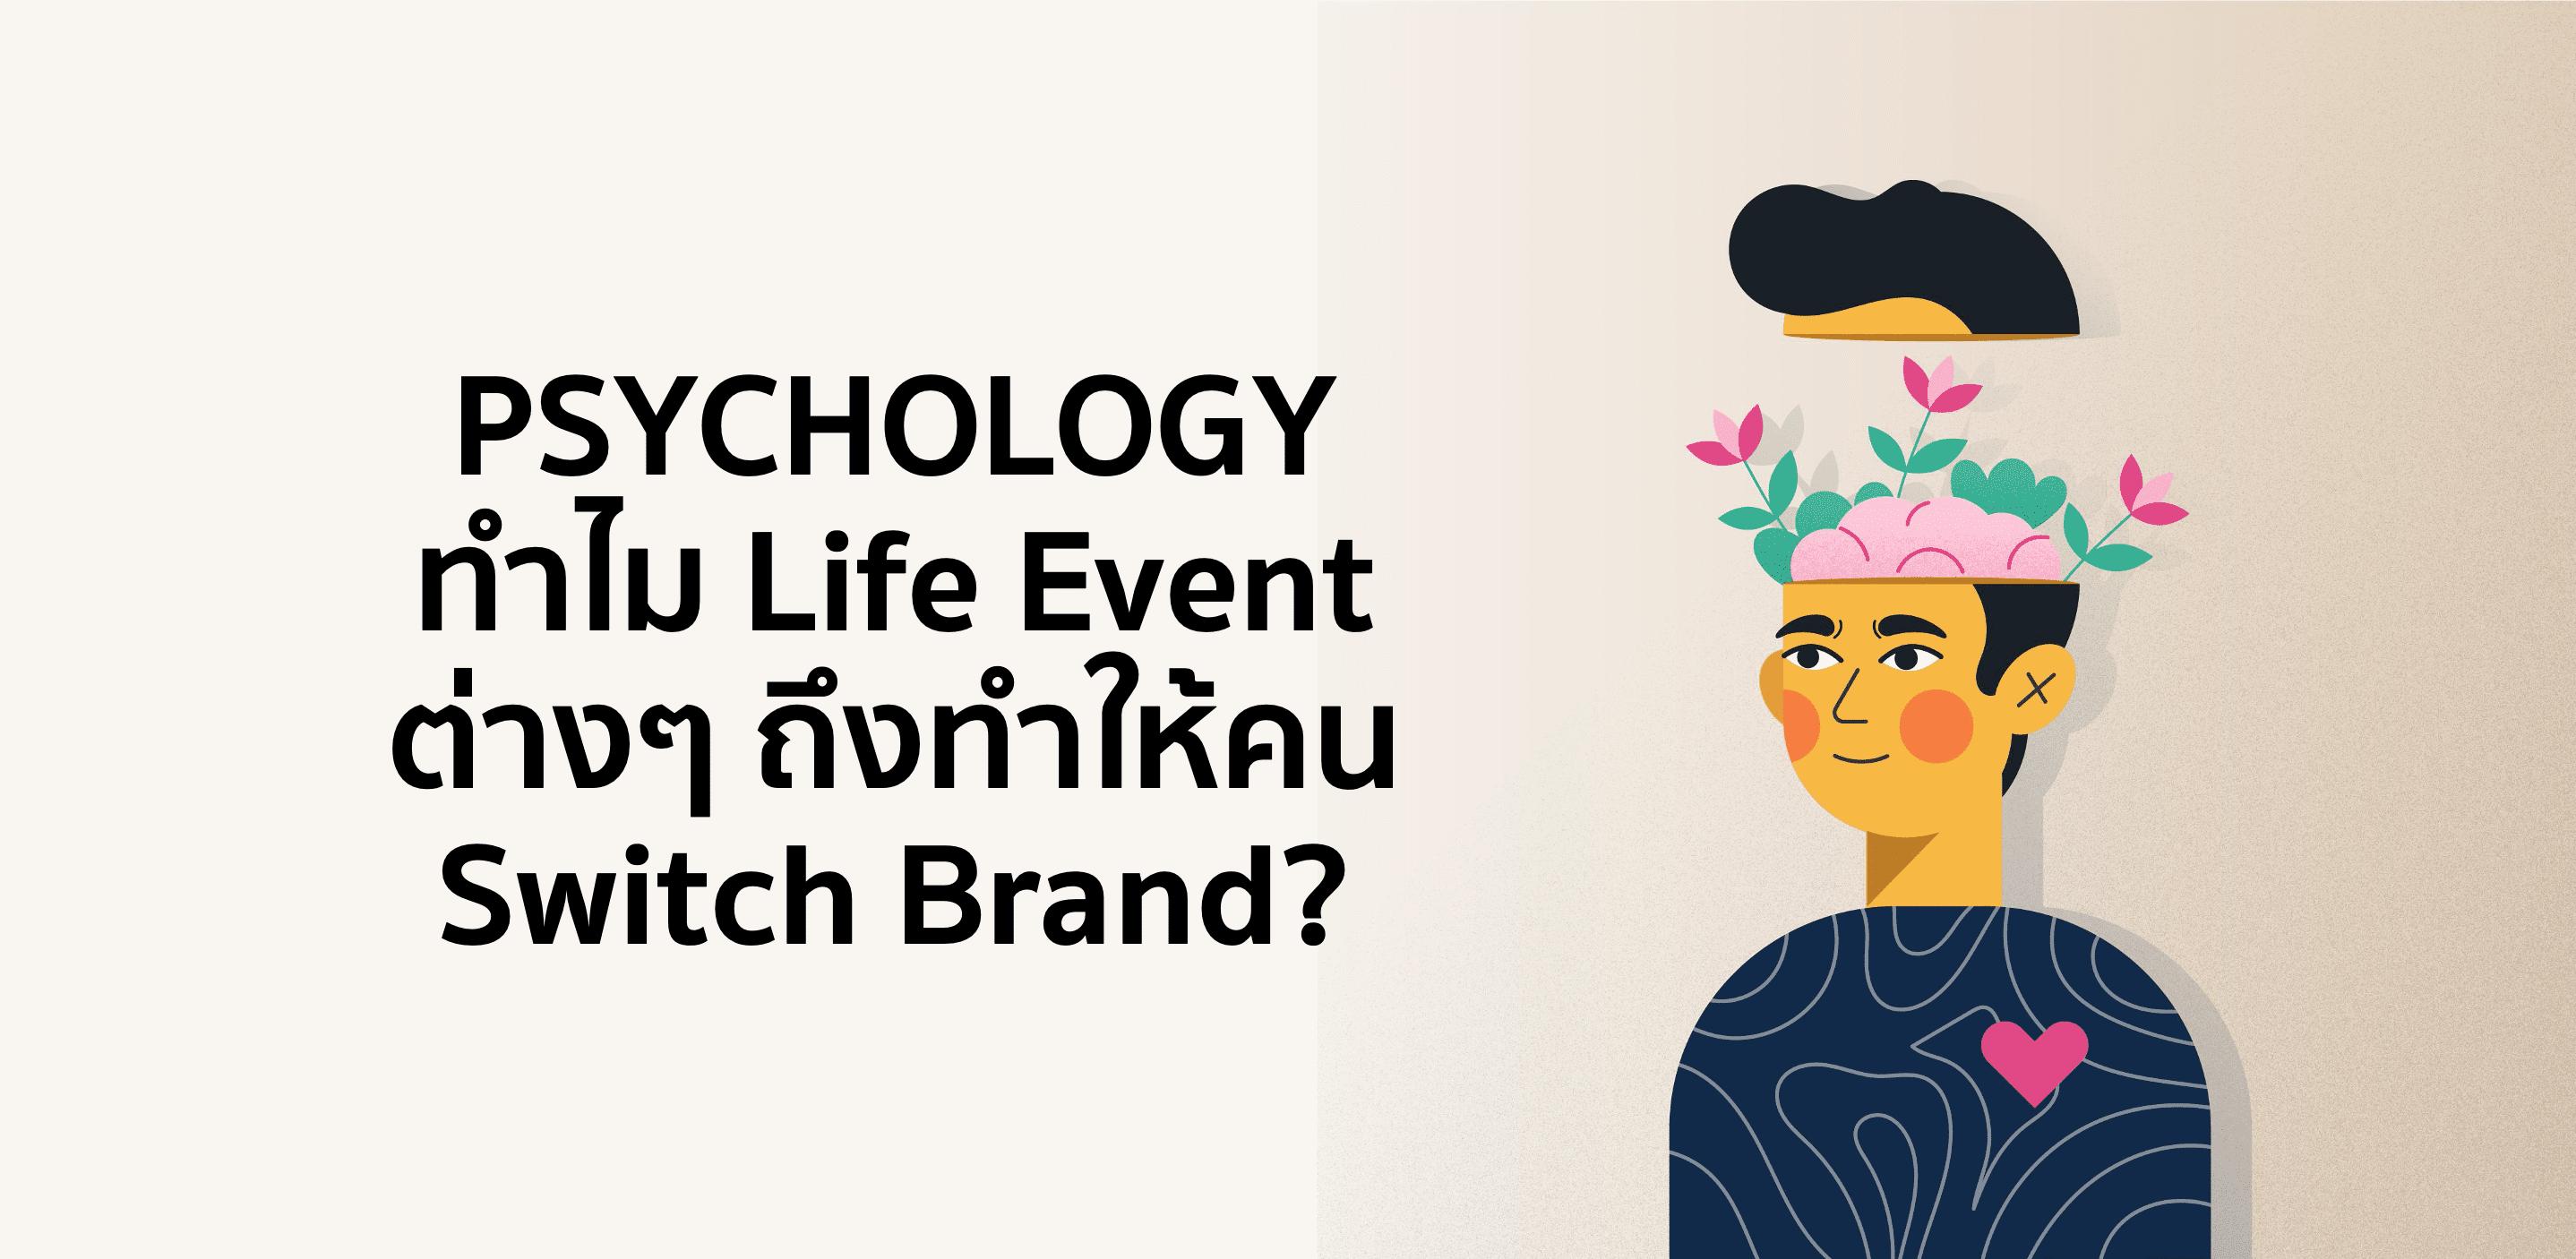 Psychology – รู้หรือไม่ Life Event ทำให้คนเปลี่ยนแบรนด์ได้